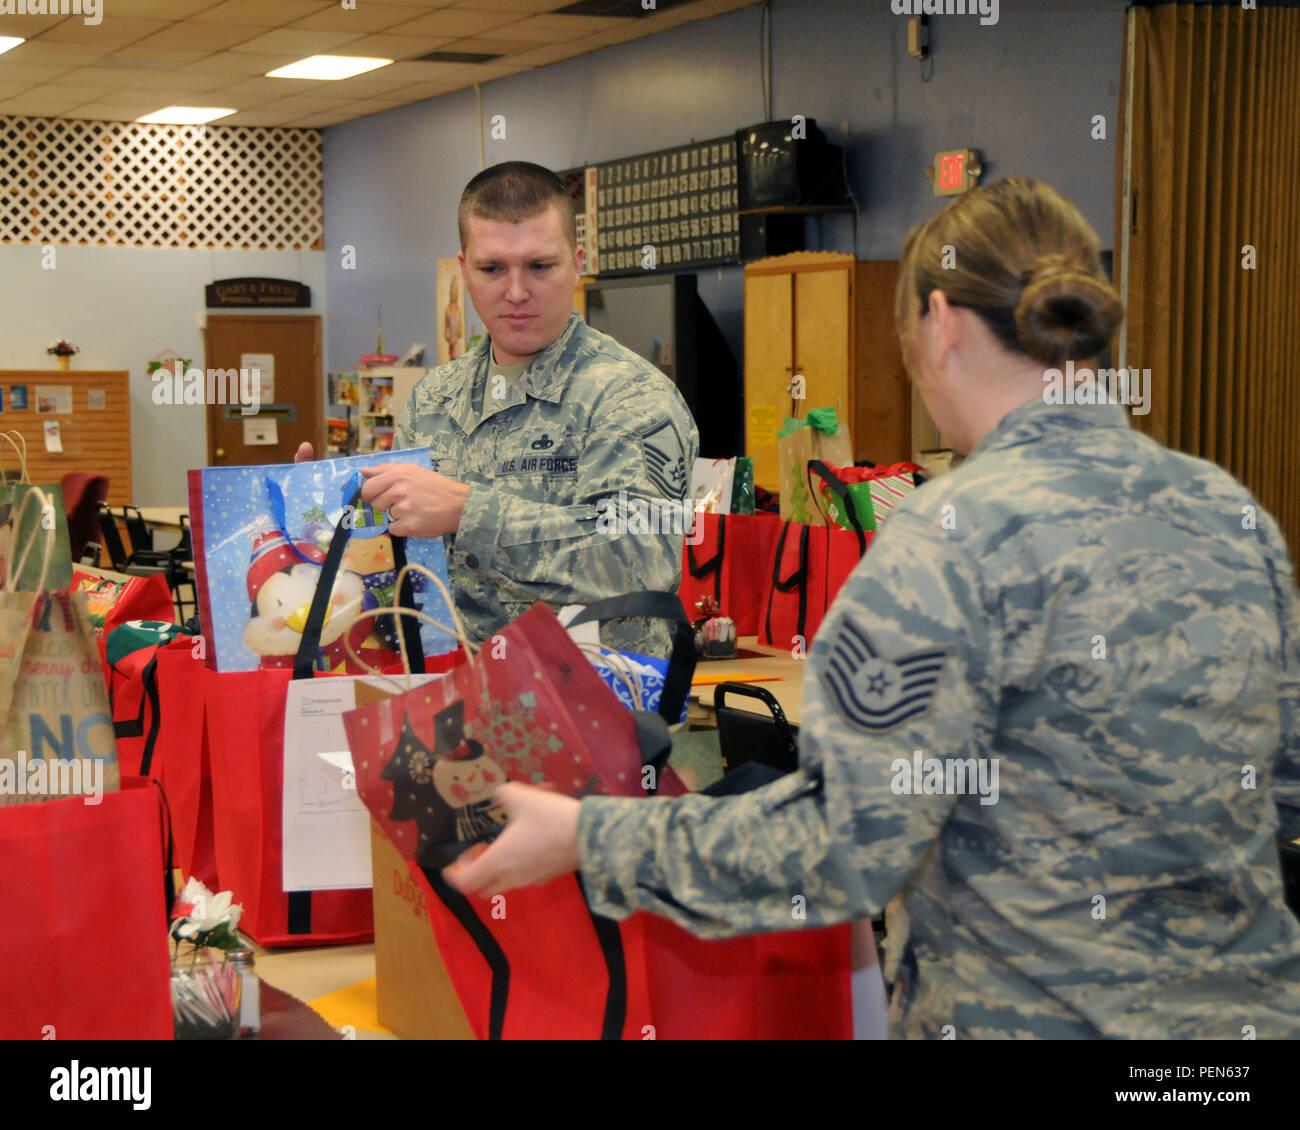 Us Air Force Master Sgt. Joseph McKenzie und Tech. Sgt. Kayla ...